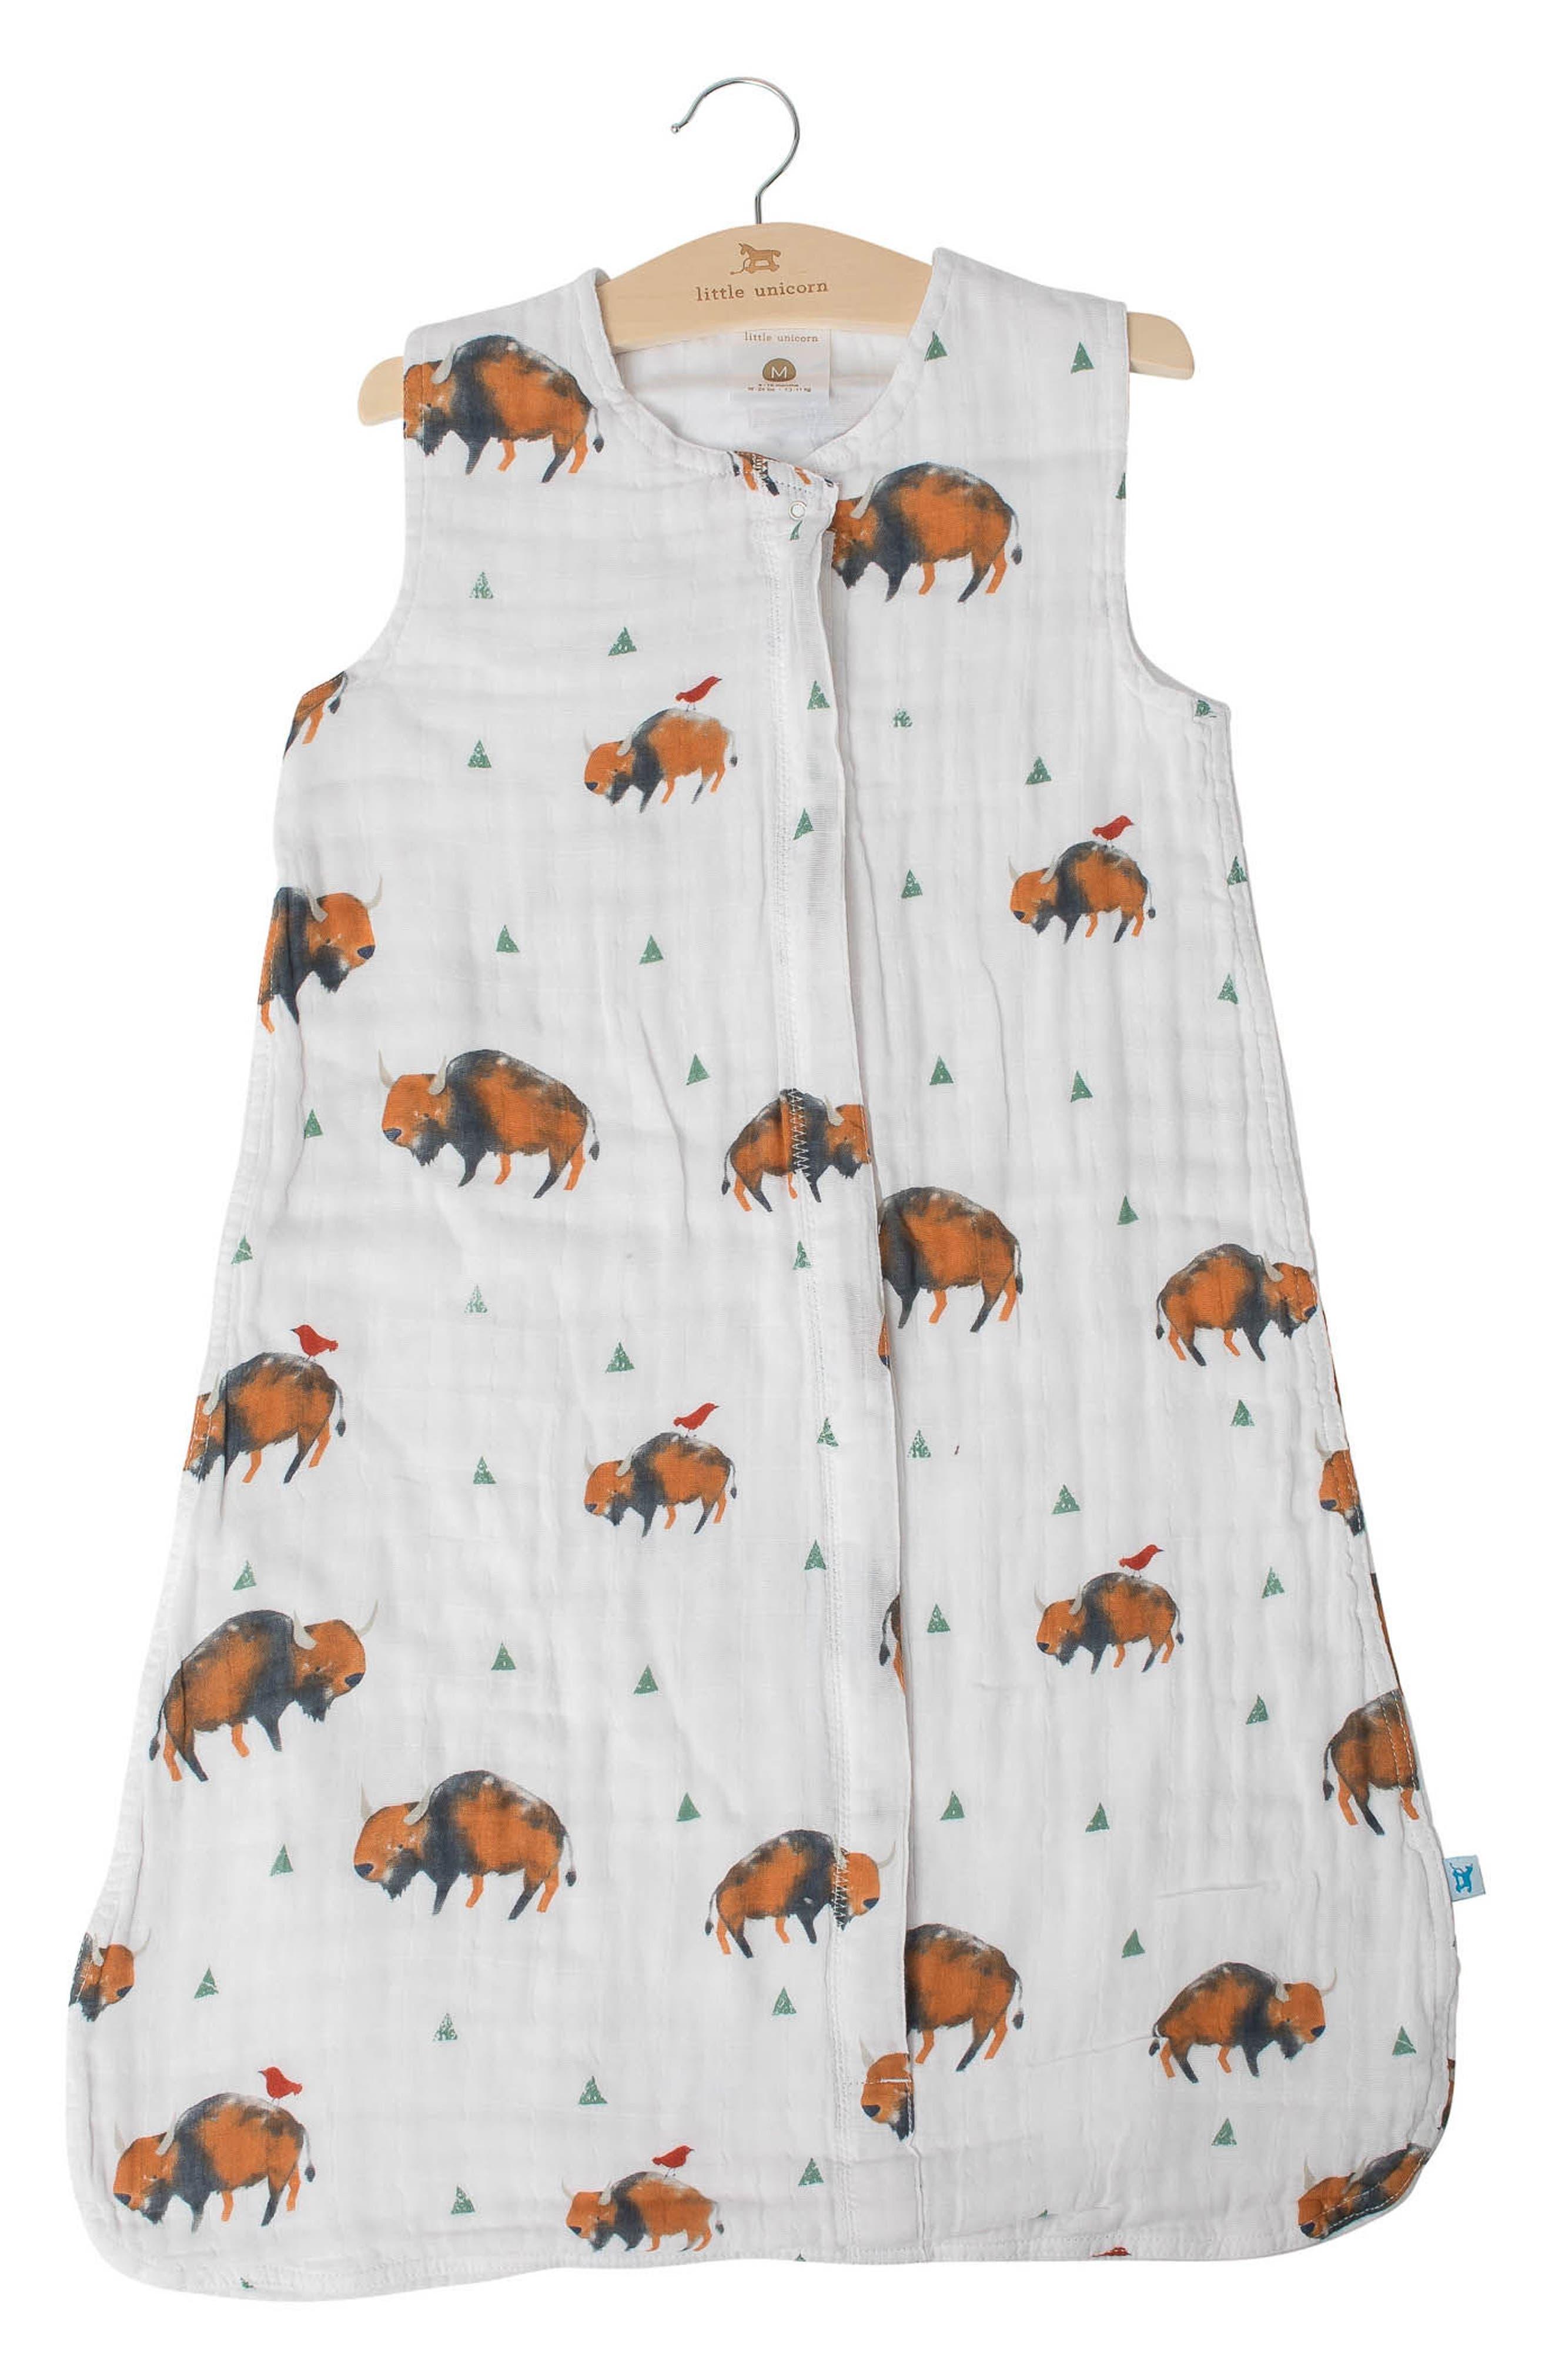 Cotton Muslin Wearable Blanket,                             Main thumbnail 1, color,                             200